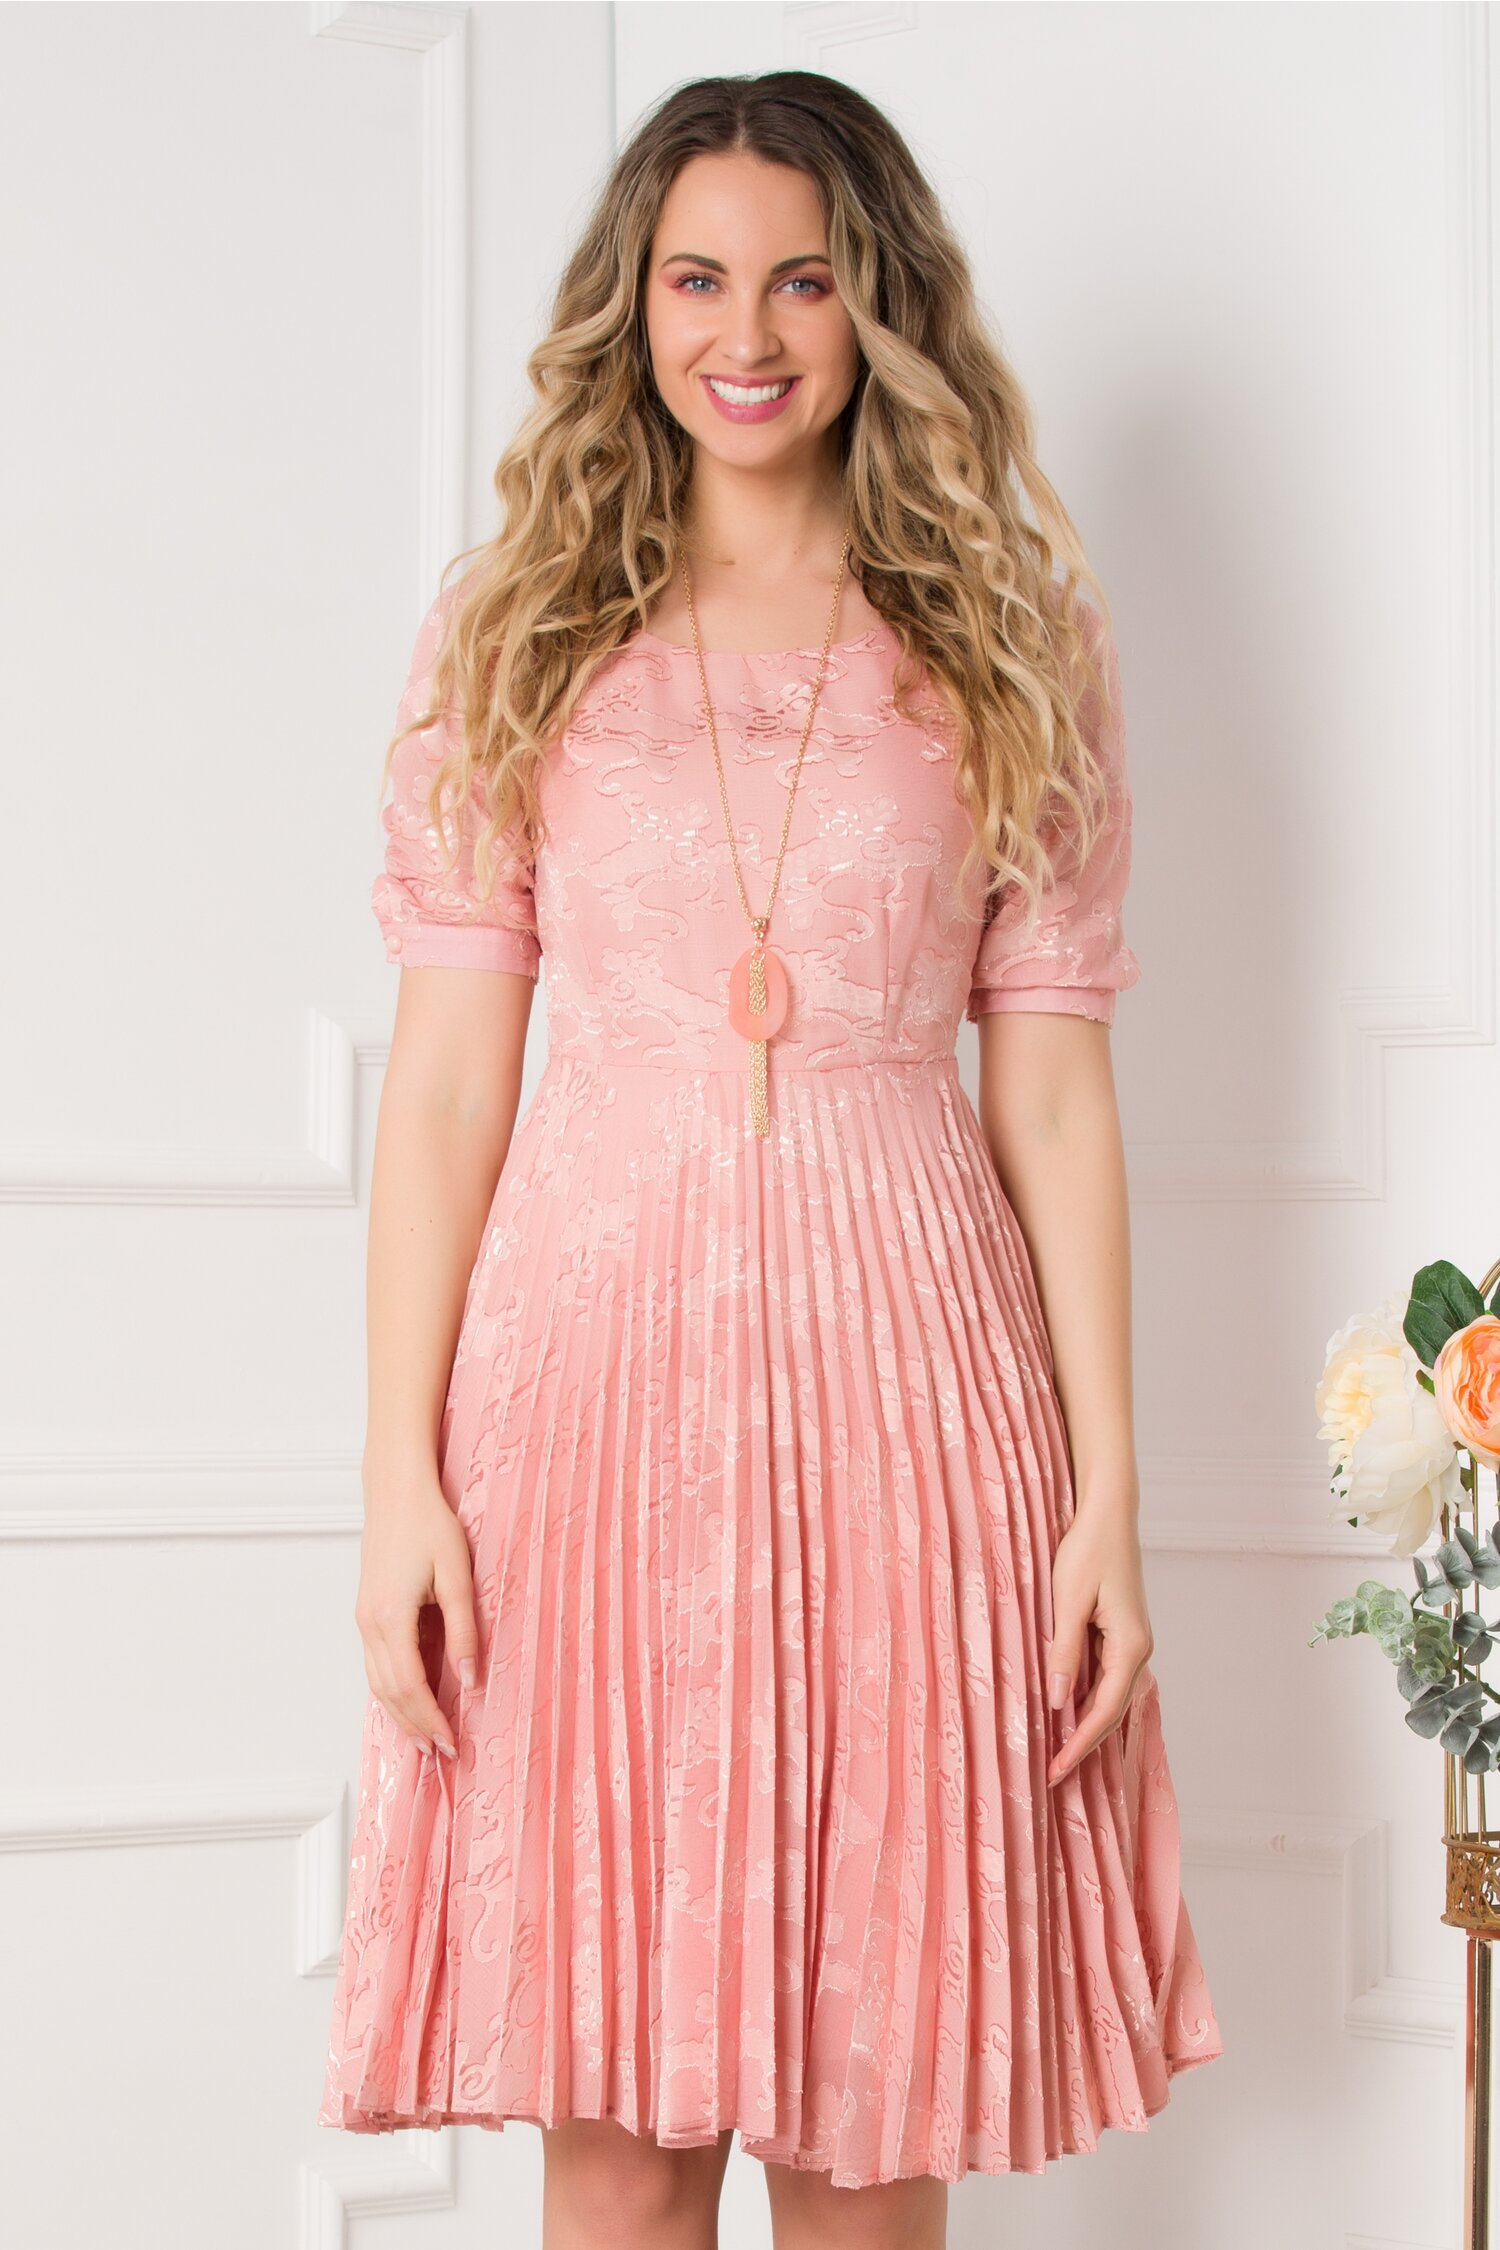 Rochie Mikaela roz cu model deosebit si pliuri imagine